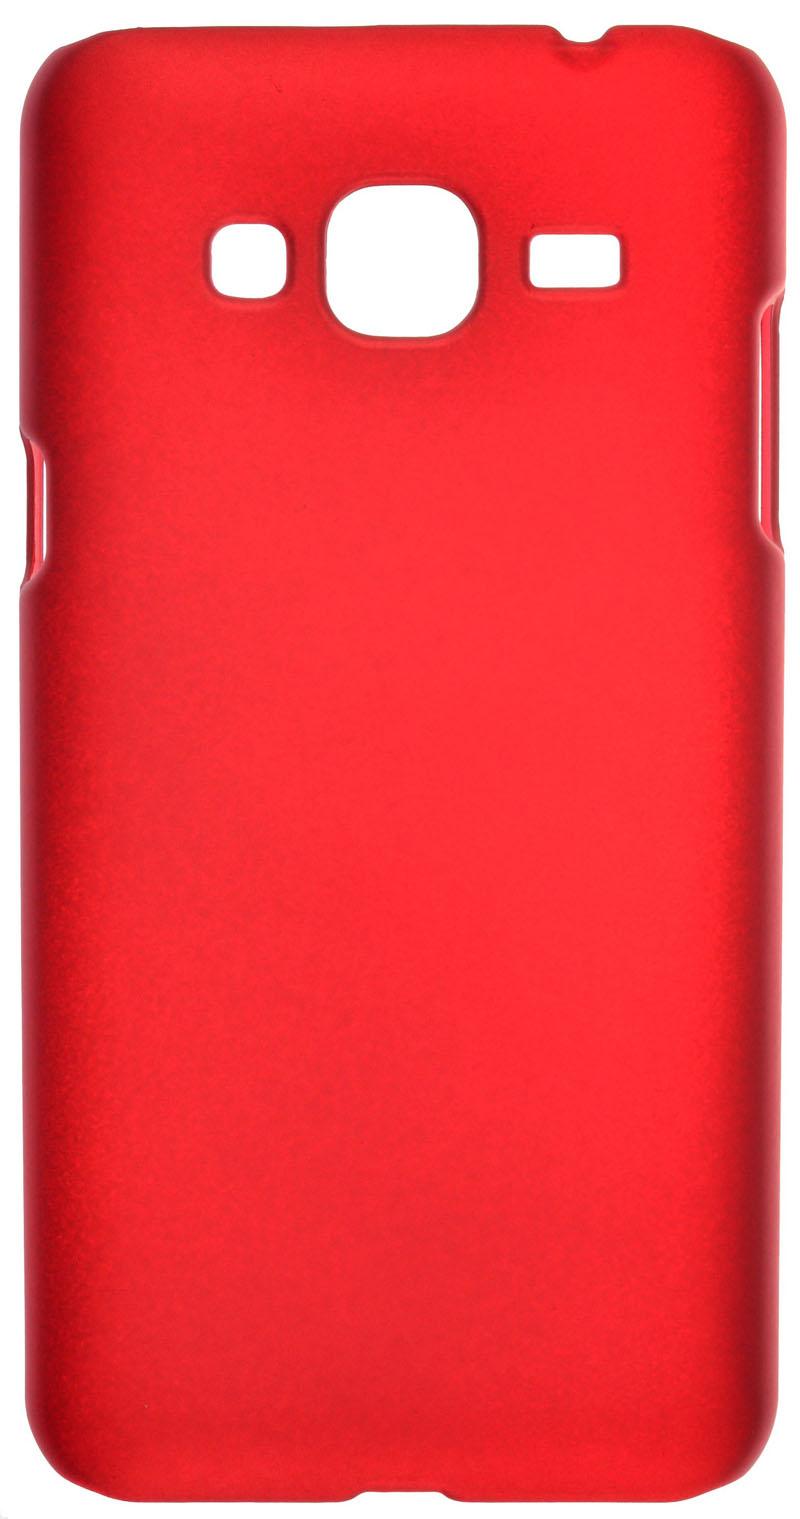 Чехол-накладка SkinBox для Samsung Galaxy J3 (2016) Серия 4People Red